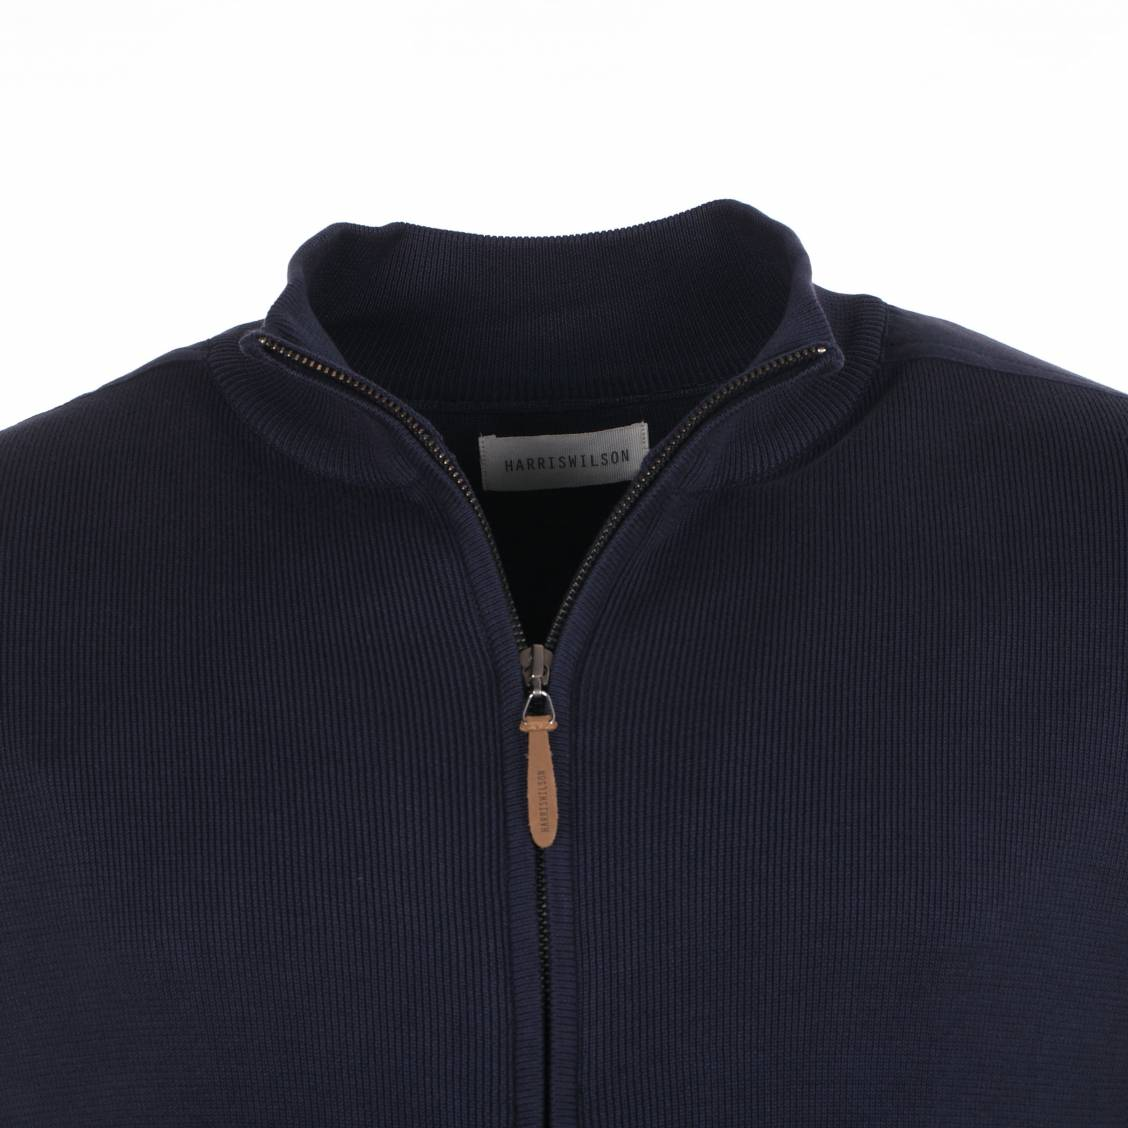 gilet zipp femme bleu marine pictures to pin on pinterest. Black Bedroom Furniture Sets. Home Design Ideas